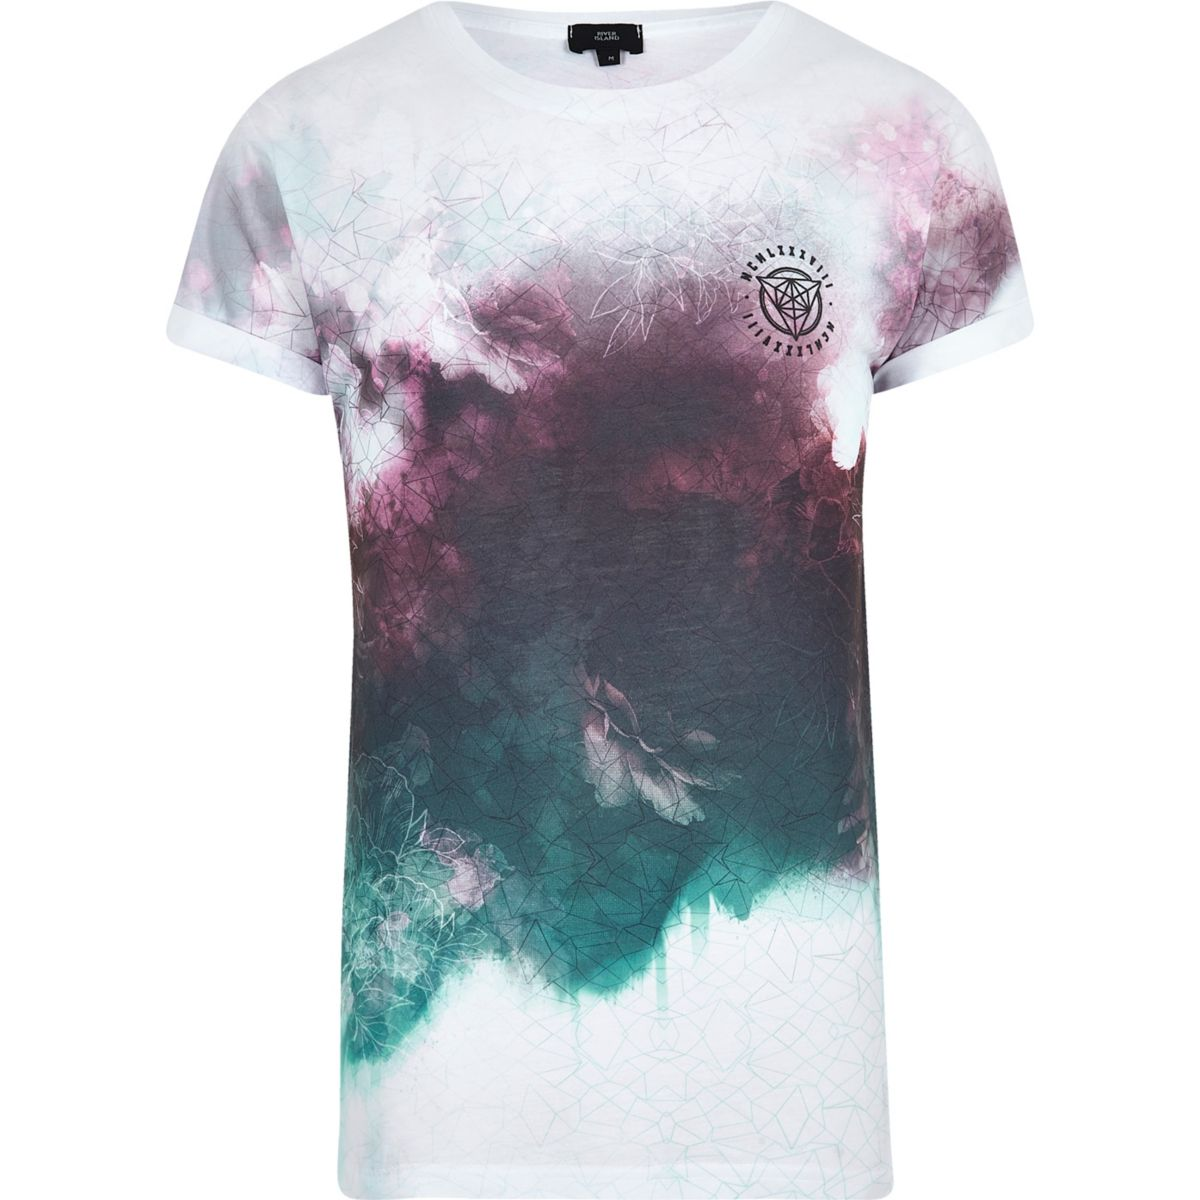 White contrast smudge print T-shirt